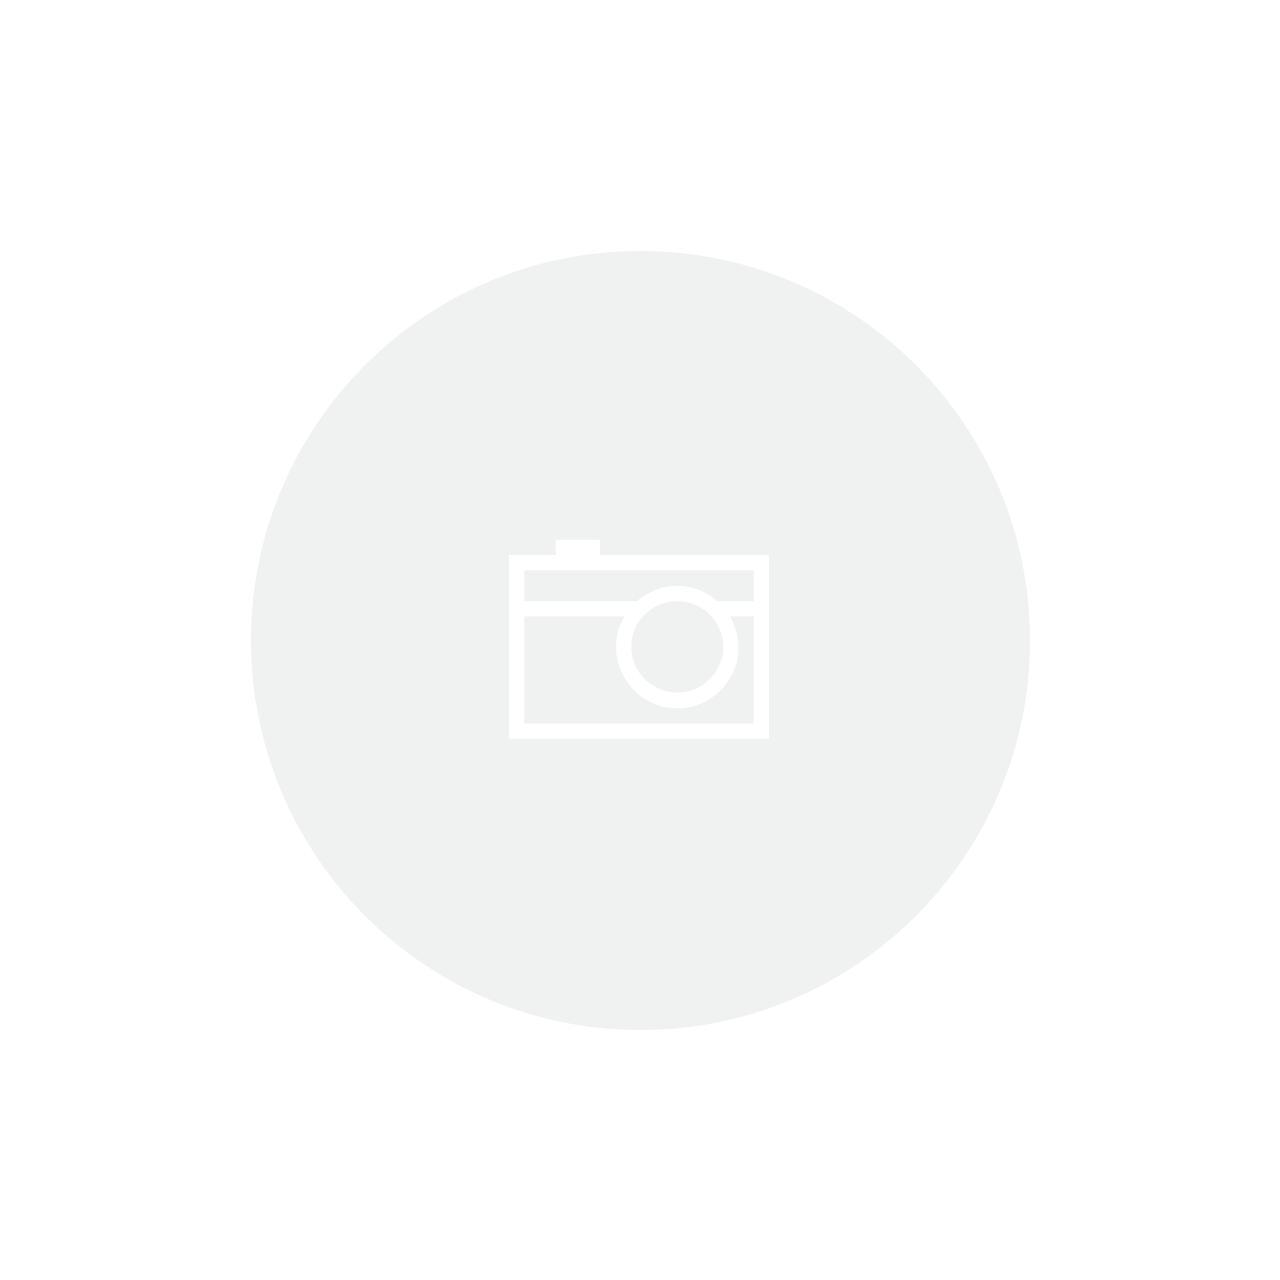 Short Tricô com Listra Lateral | Pv050